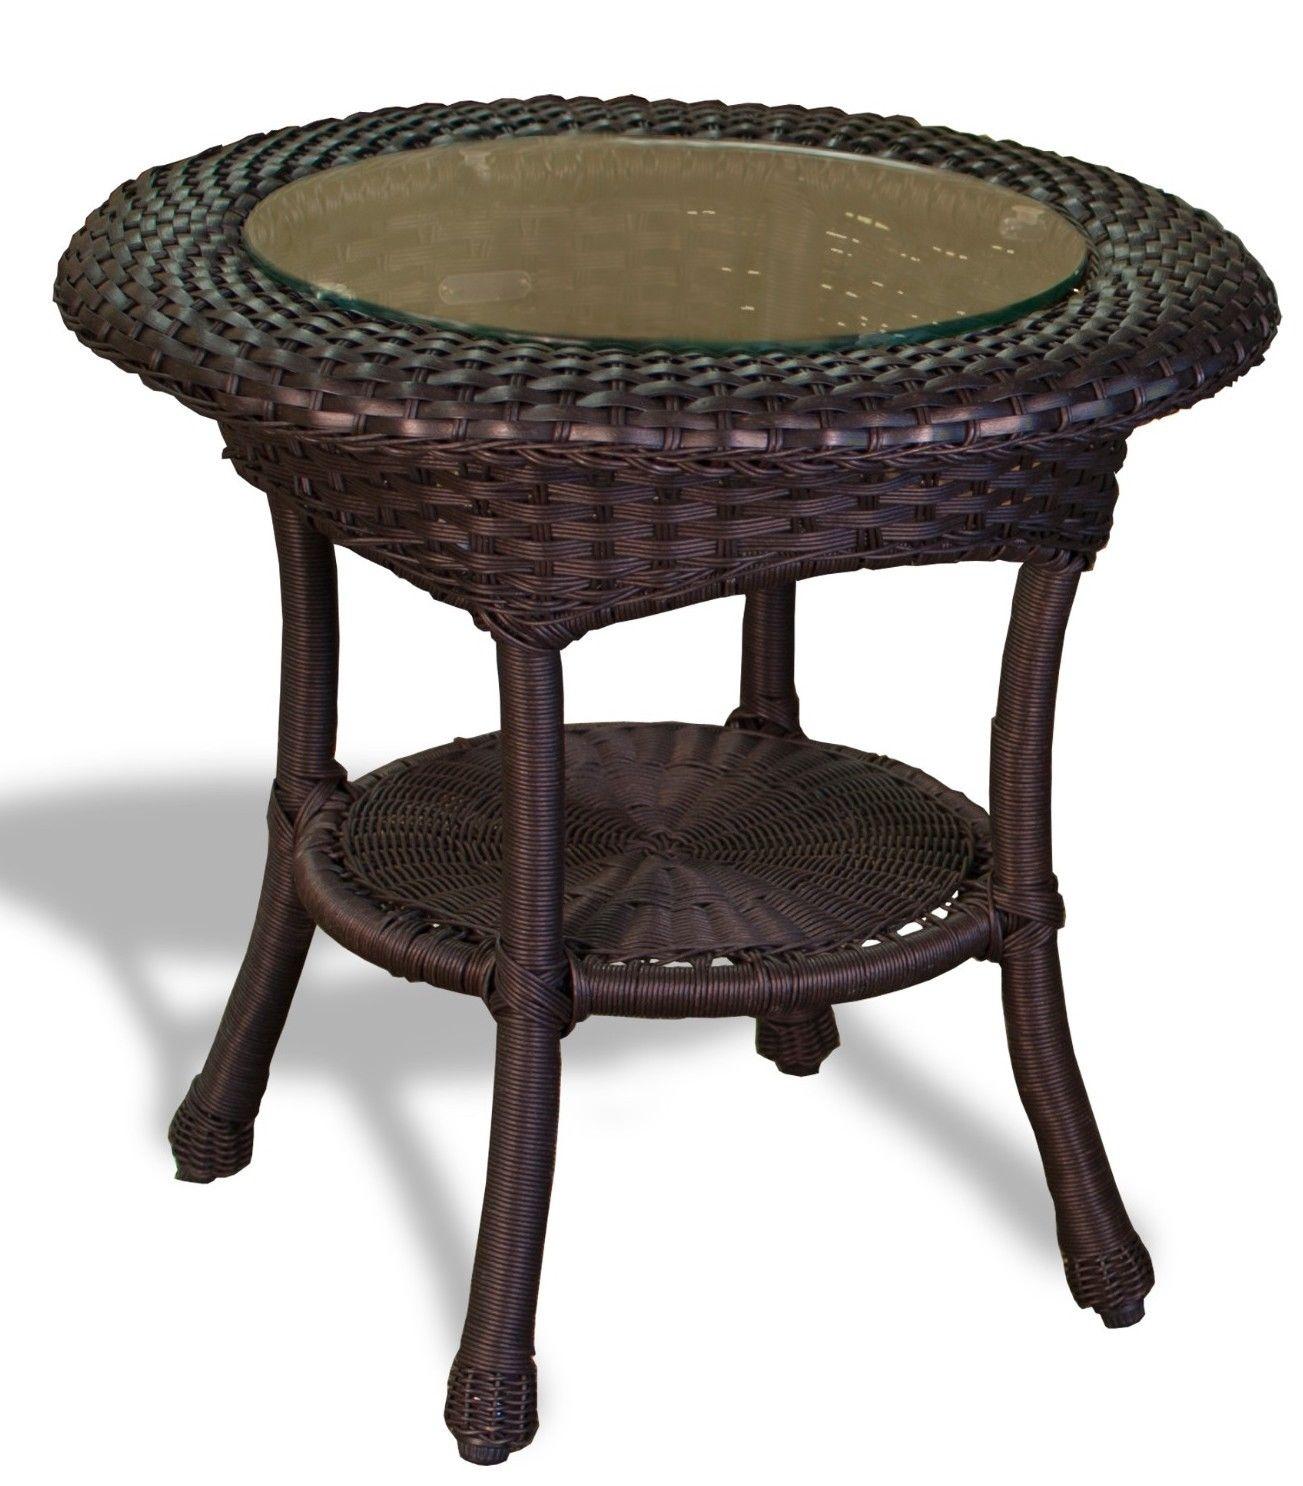 #121 - Outdoor Patio Garden Furniture Tortoise Resin Wicker Side Table - Aluminum Frame